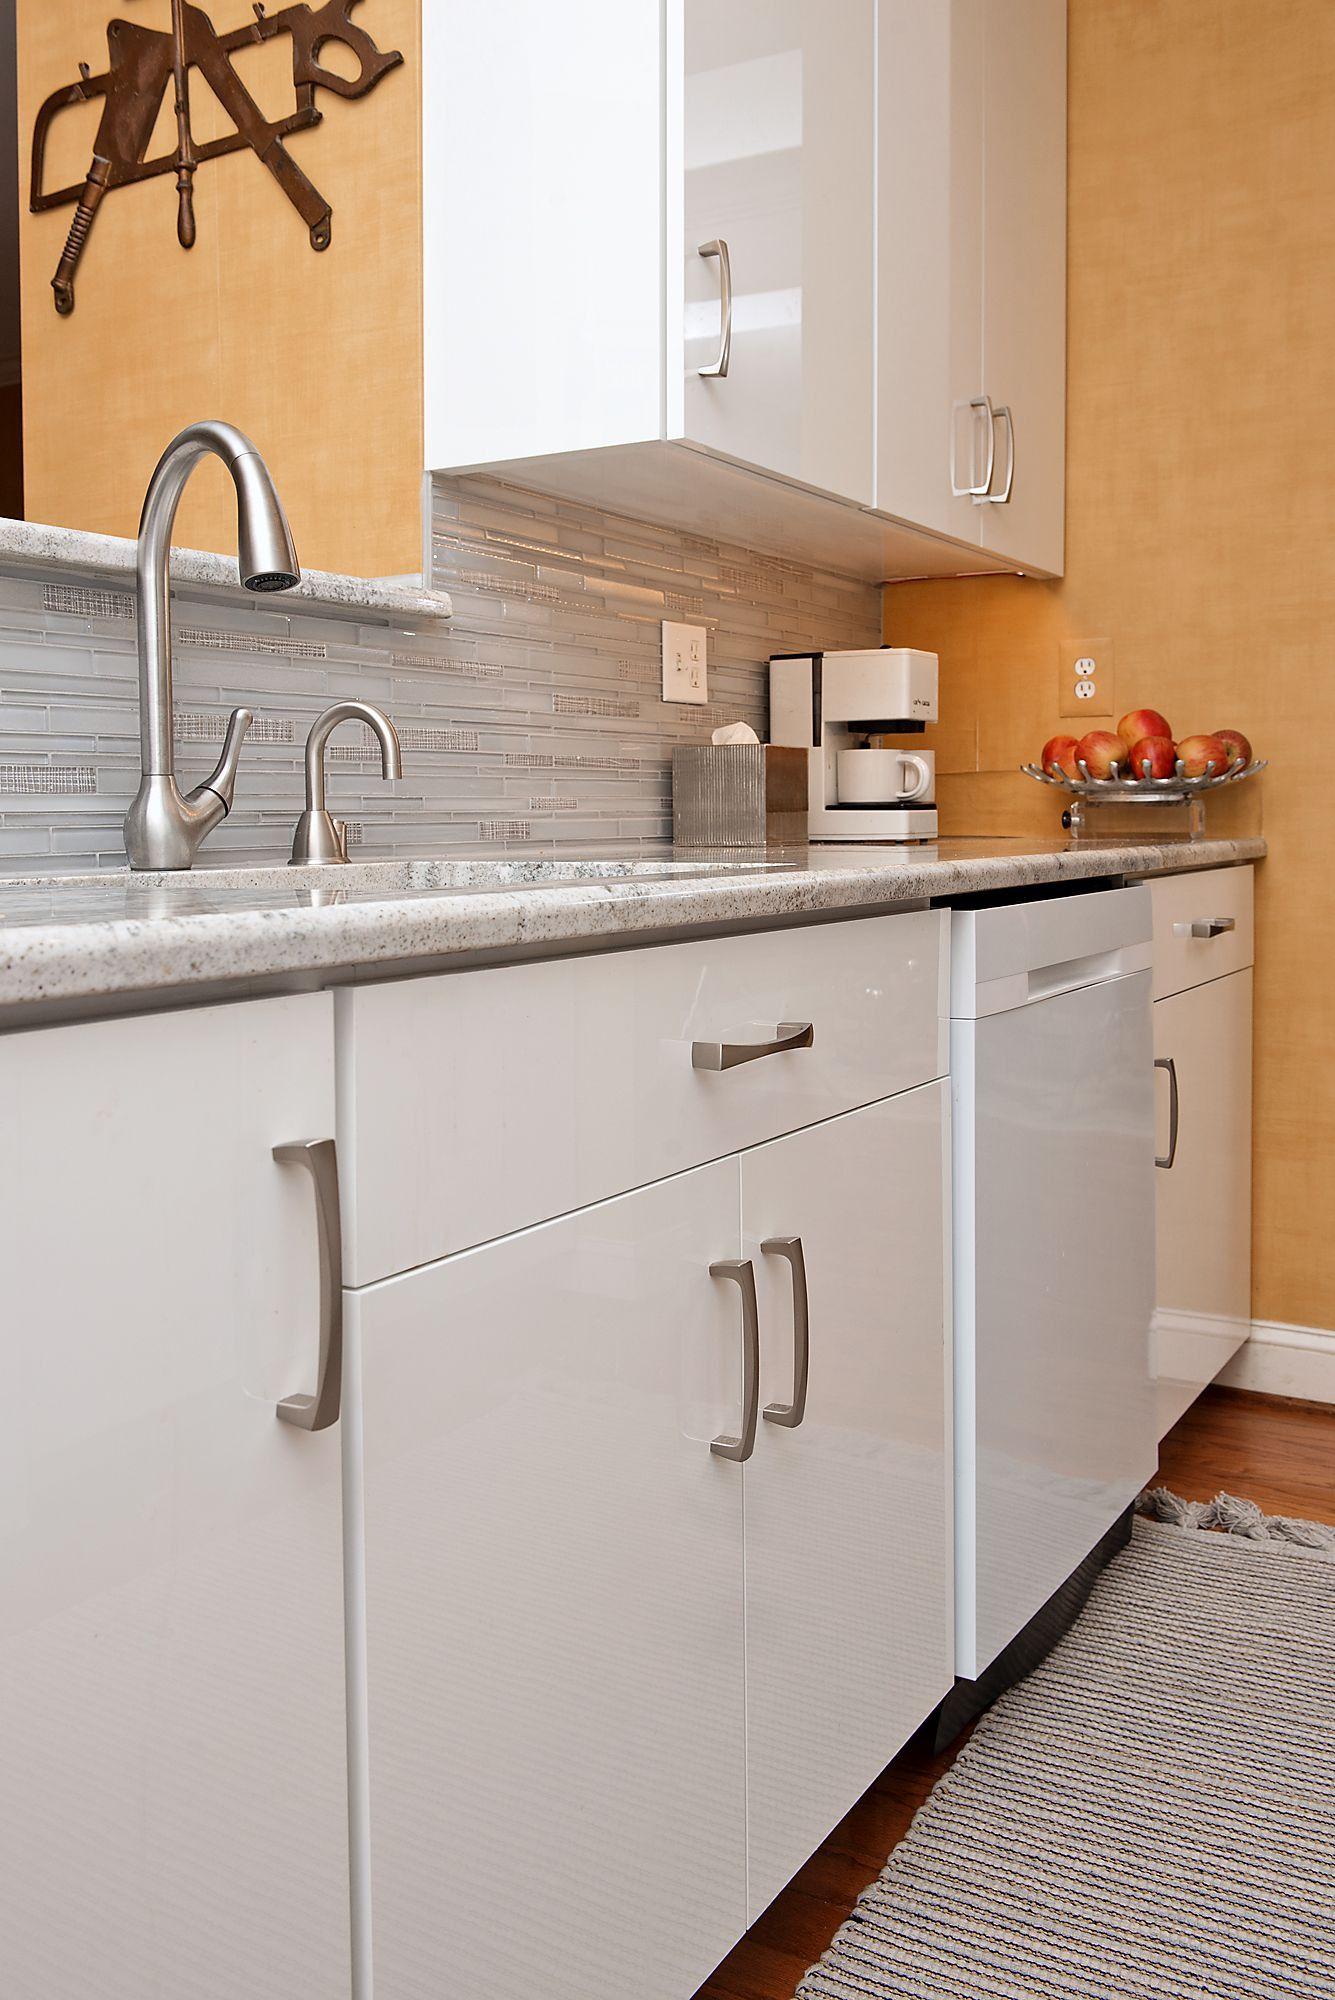 Slab Door Kitchen Cabinets 2020